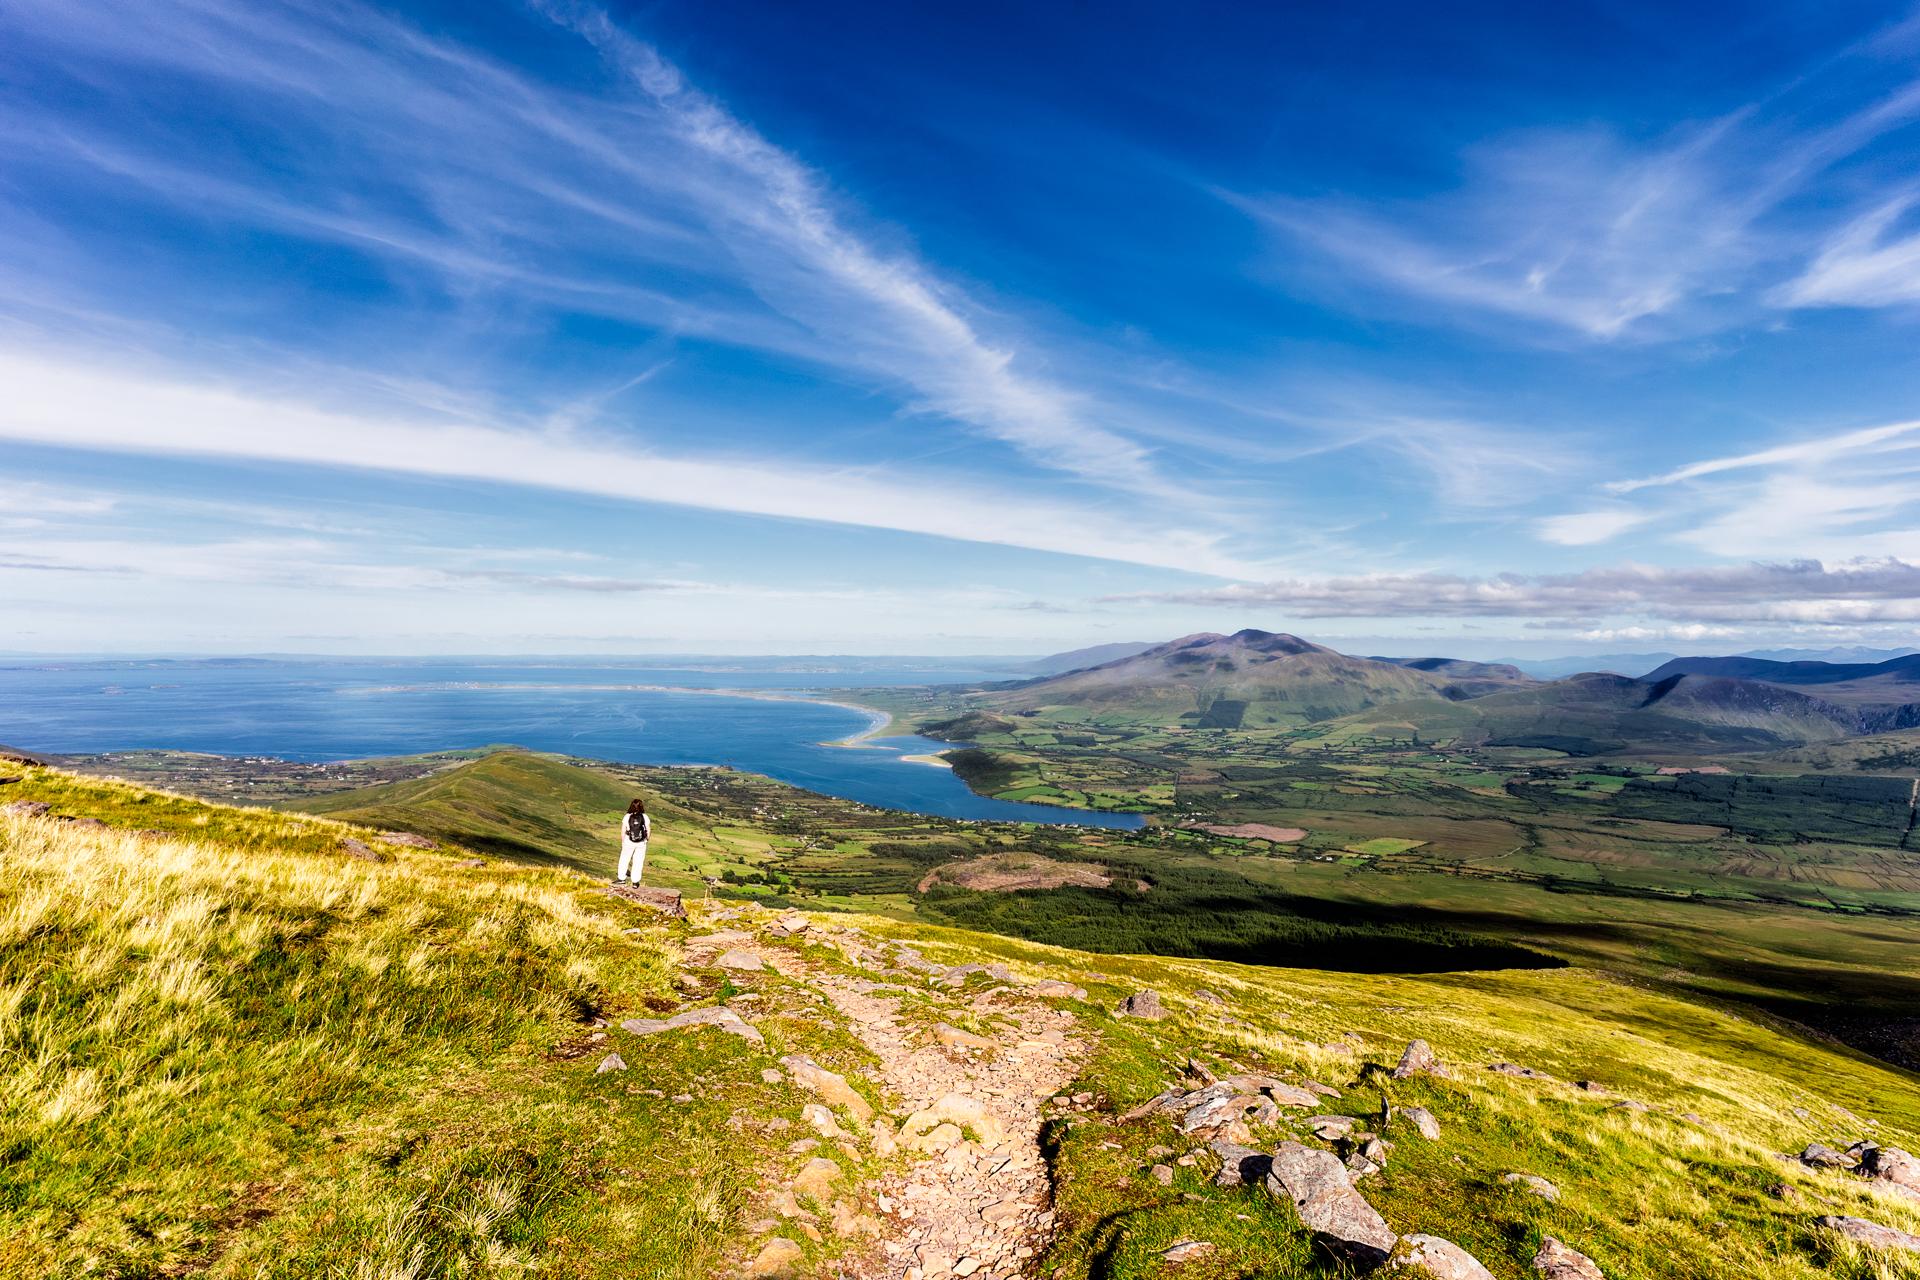 Ireland. Wild Atlantic Way. Kerry. Counthy Kerry. Travel photography. Landscape photography. Blog. Irish. Travelling Ireland. Ireland west coast. Wild Landscape. Trip. Vacation. -25.jpg